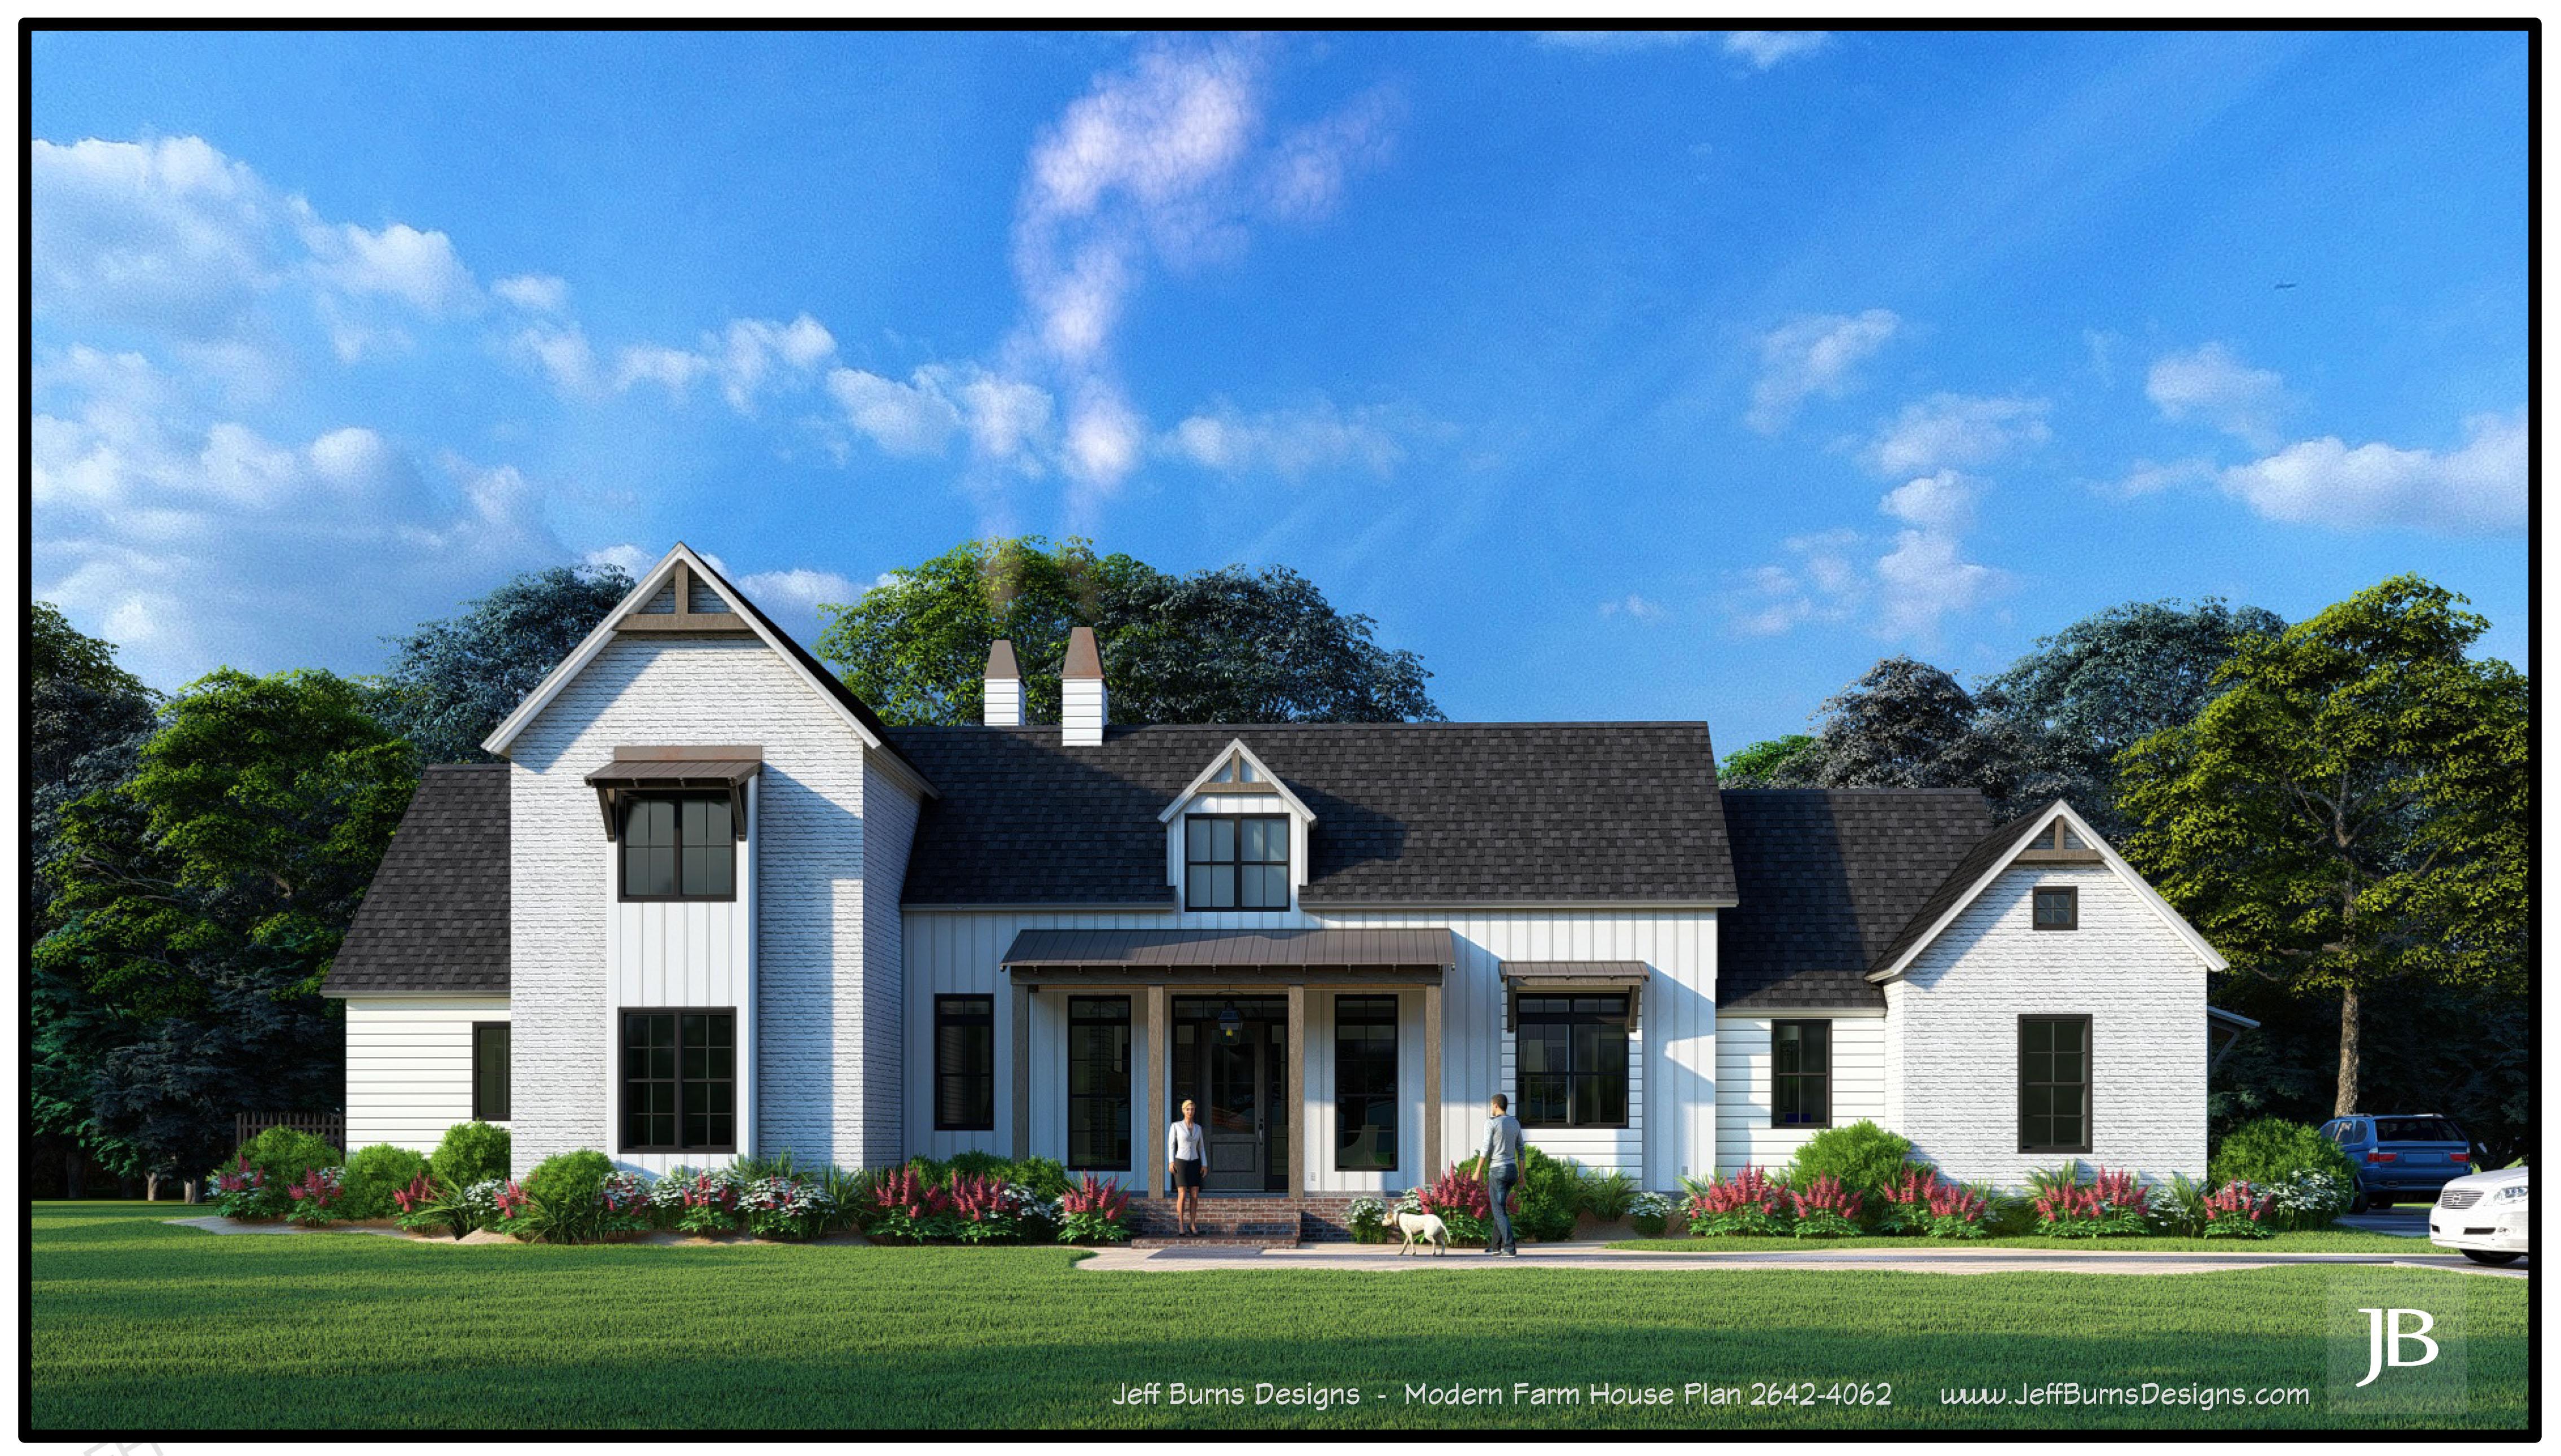 Modern Farm House  2642-4062